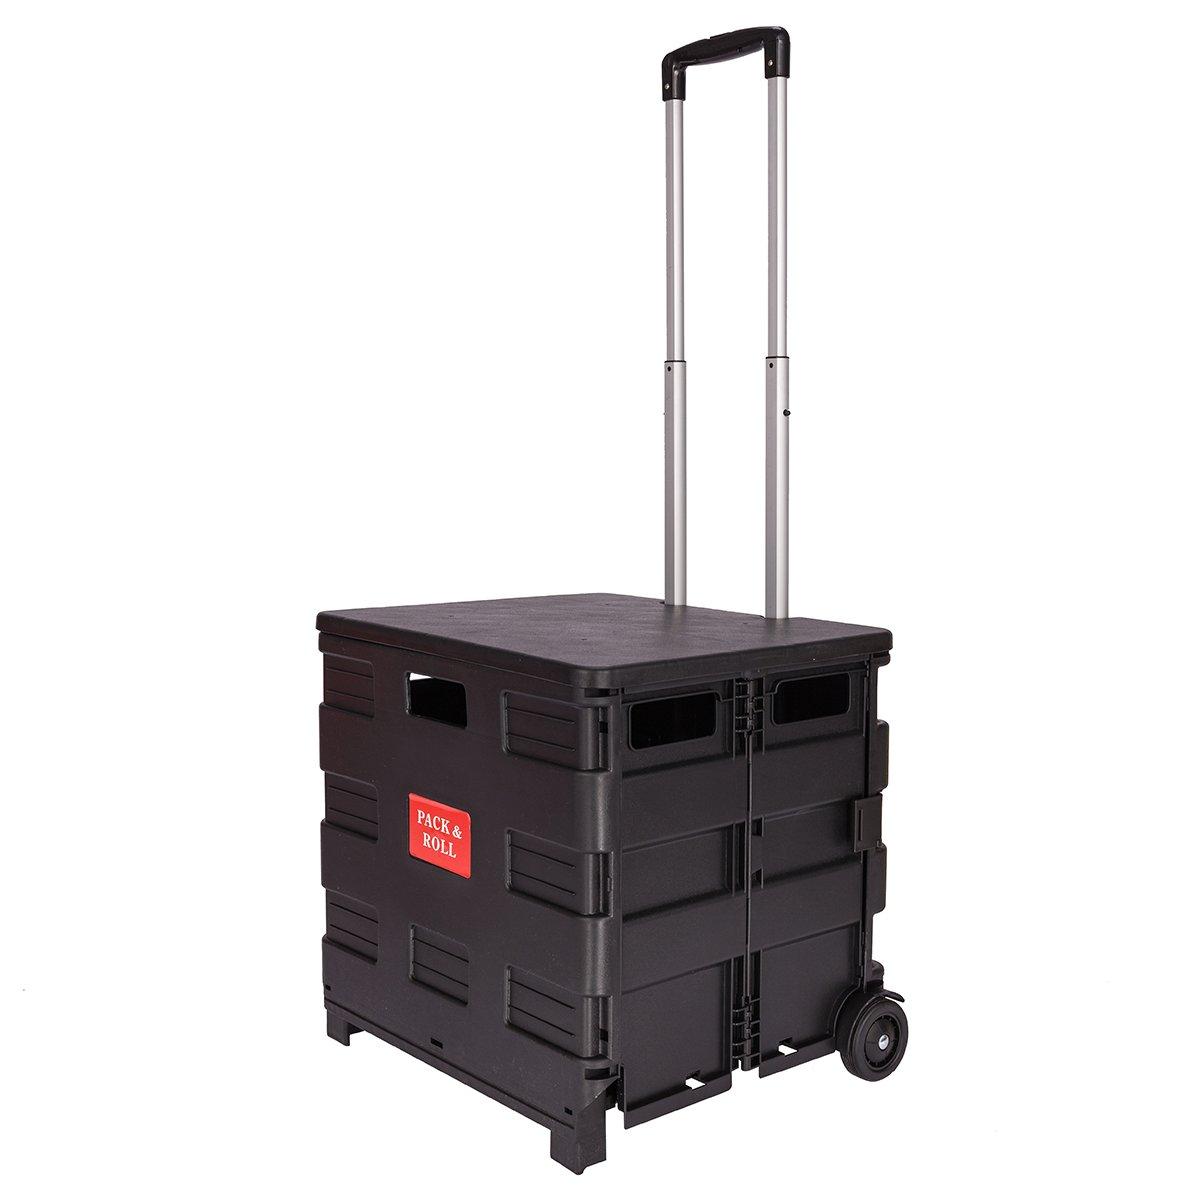 DXP Large Folding Shopping Cart Trolley Transport Storage Trolley 2 Wheels Black 35kg WS-01